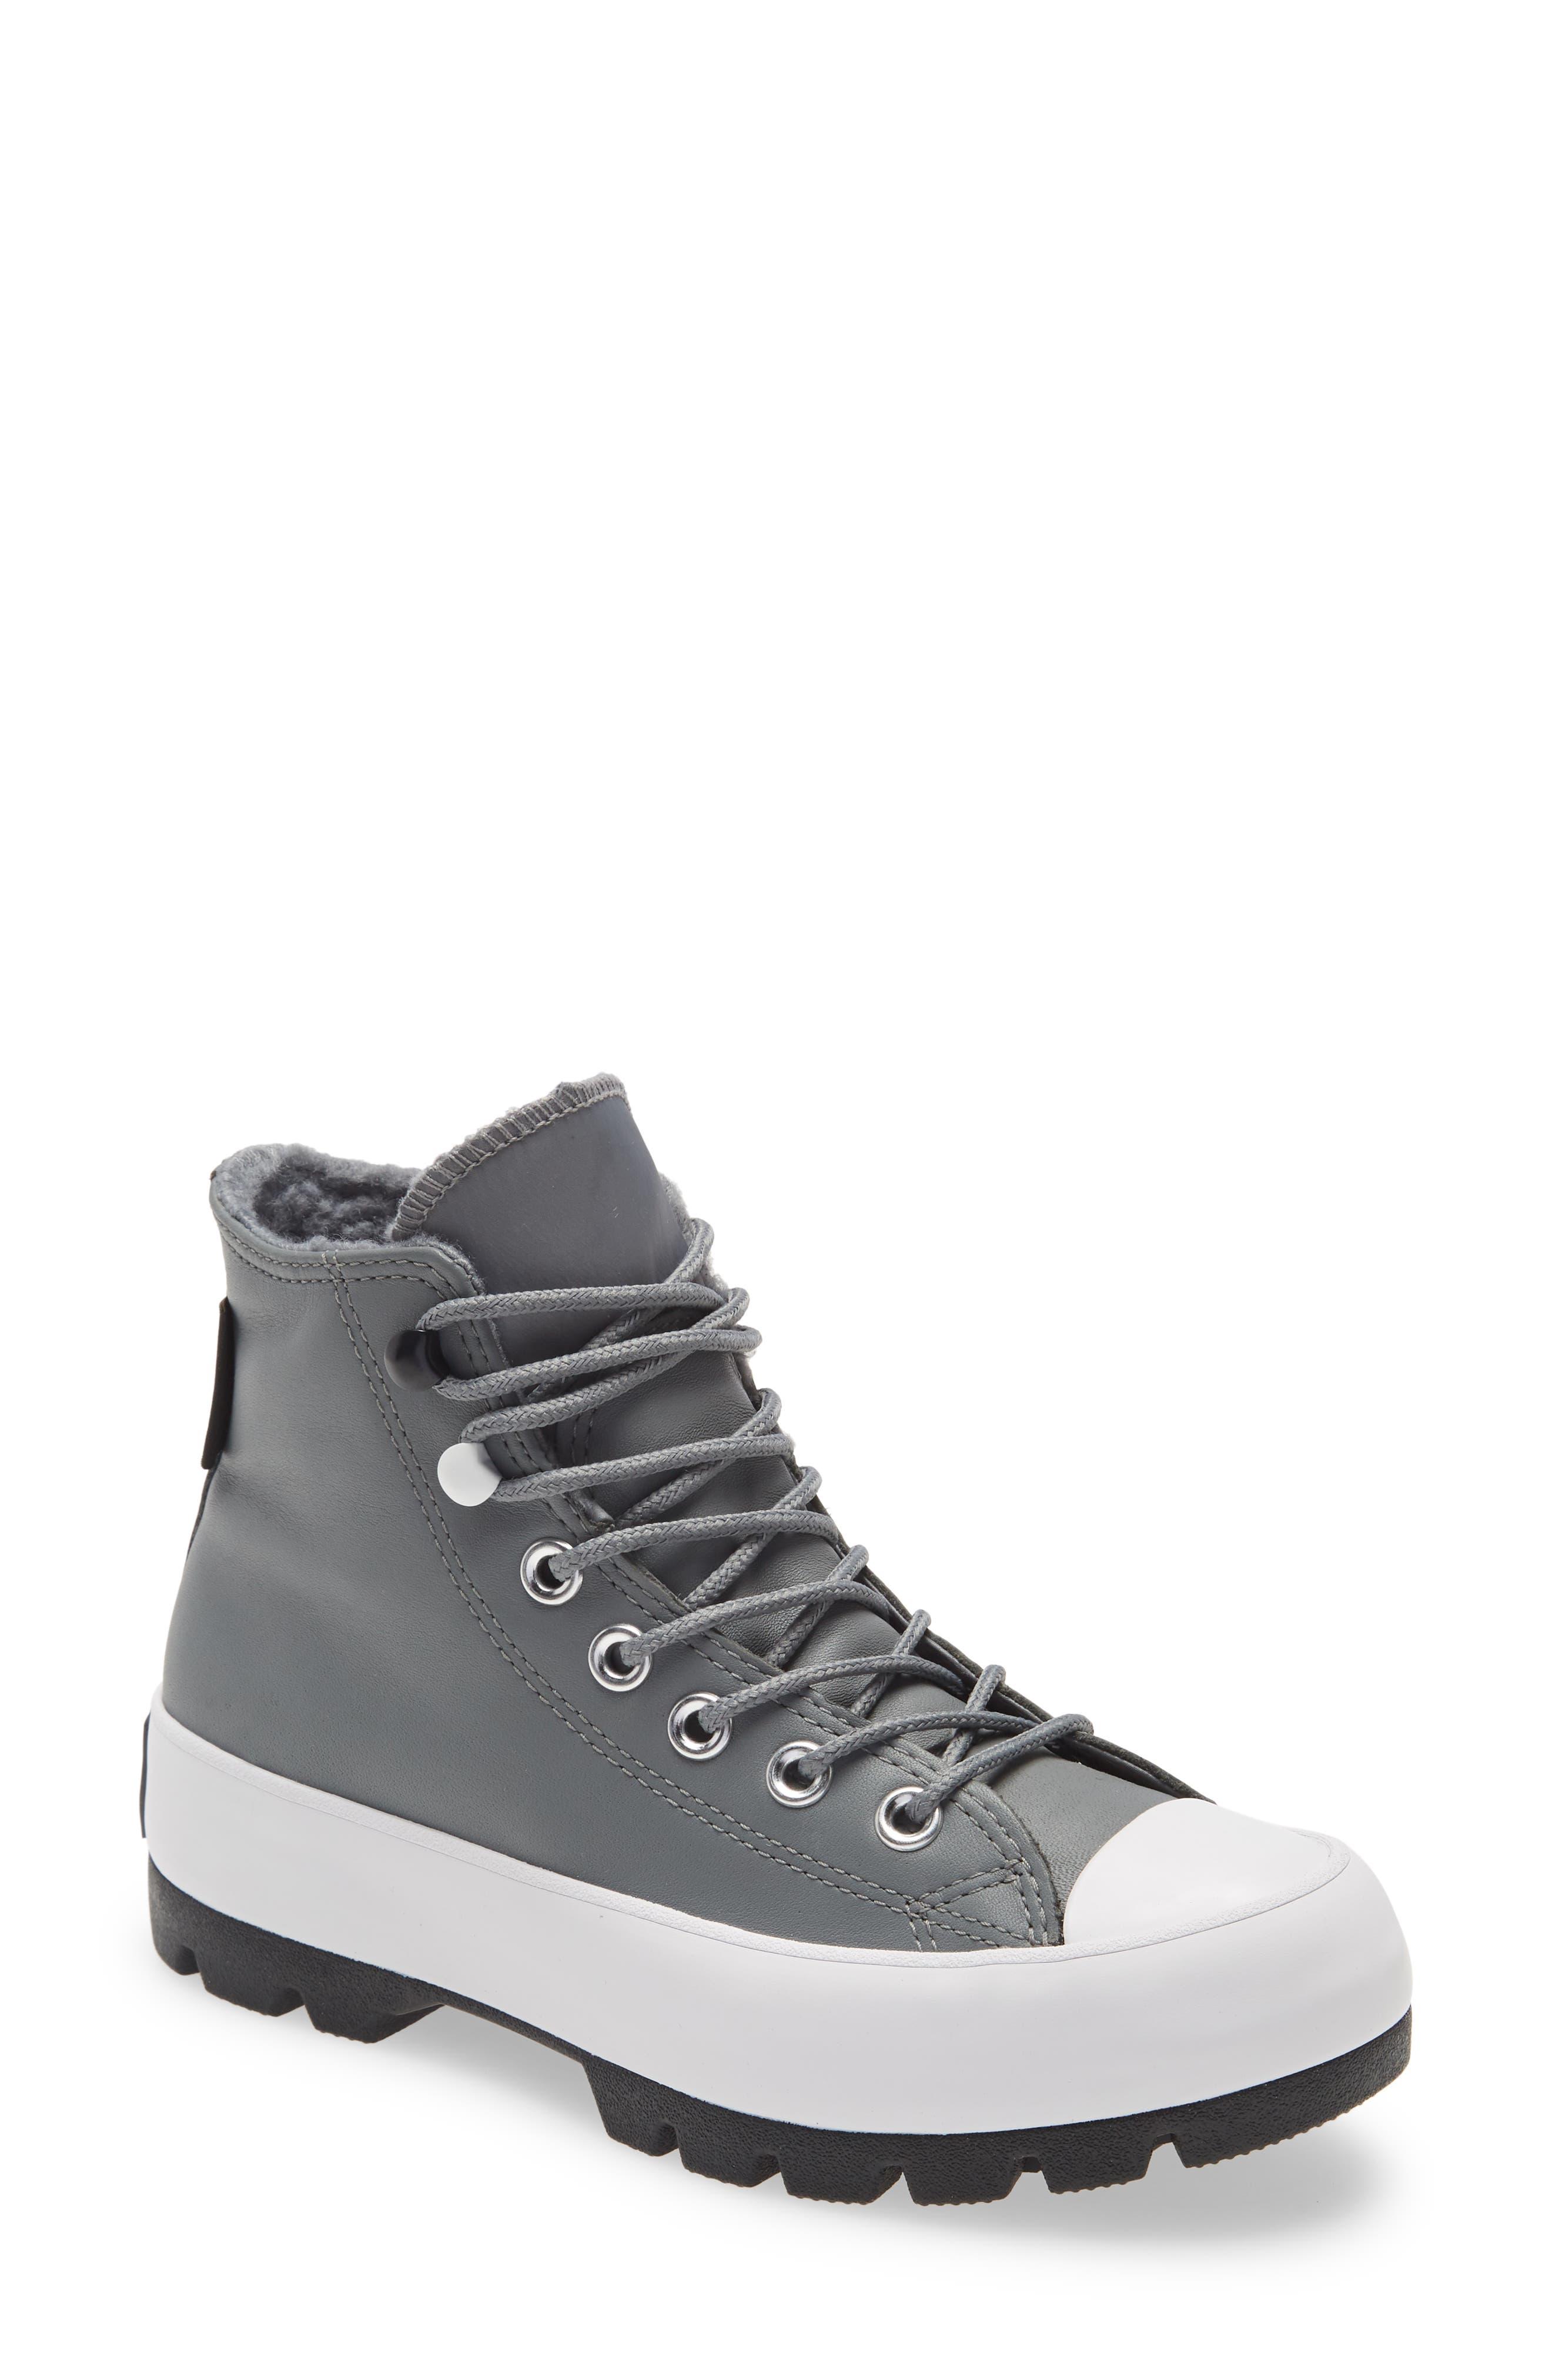 Women s Converse Chuck Taylor All Star Lugged Waterproof High Top Sneaker E51